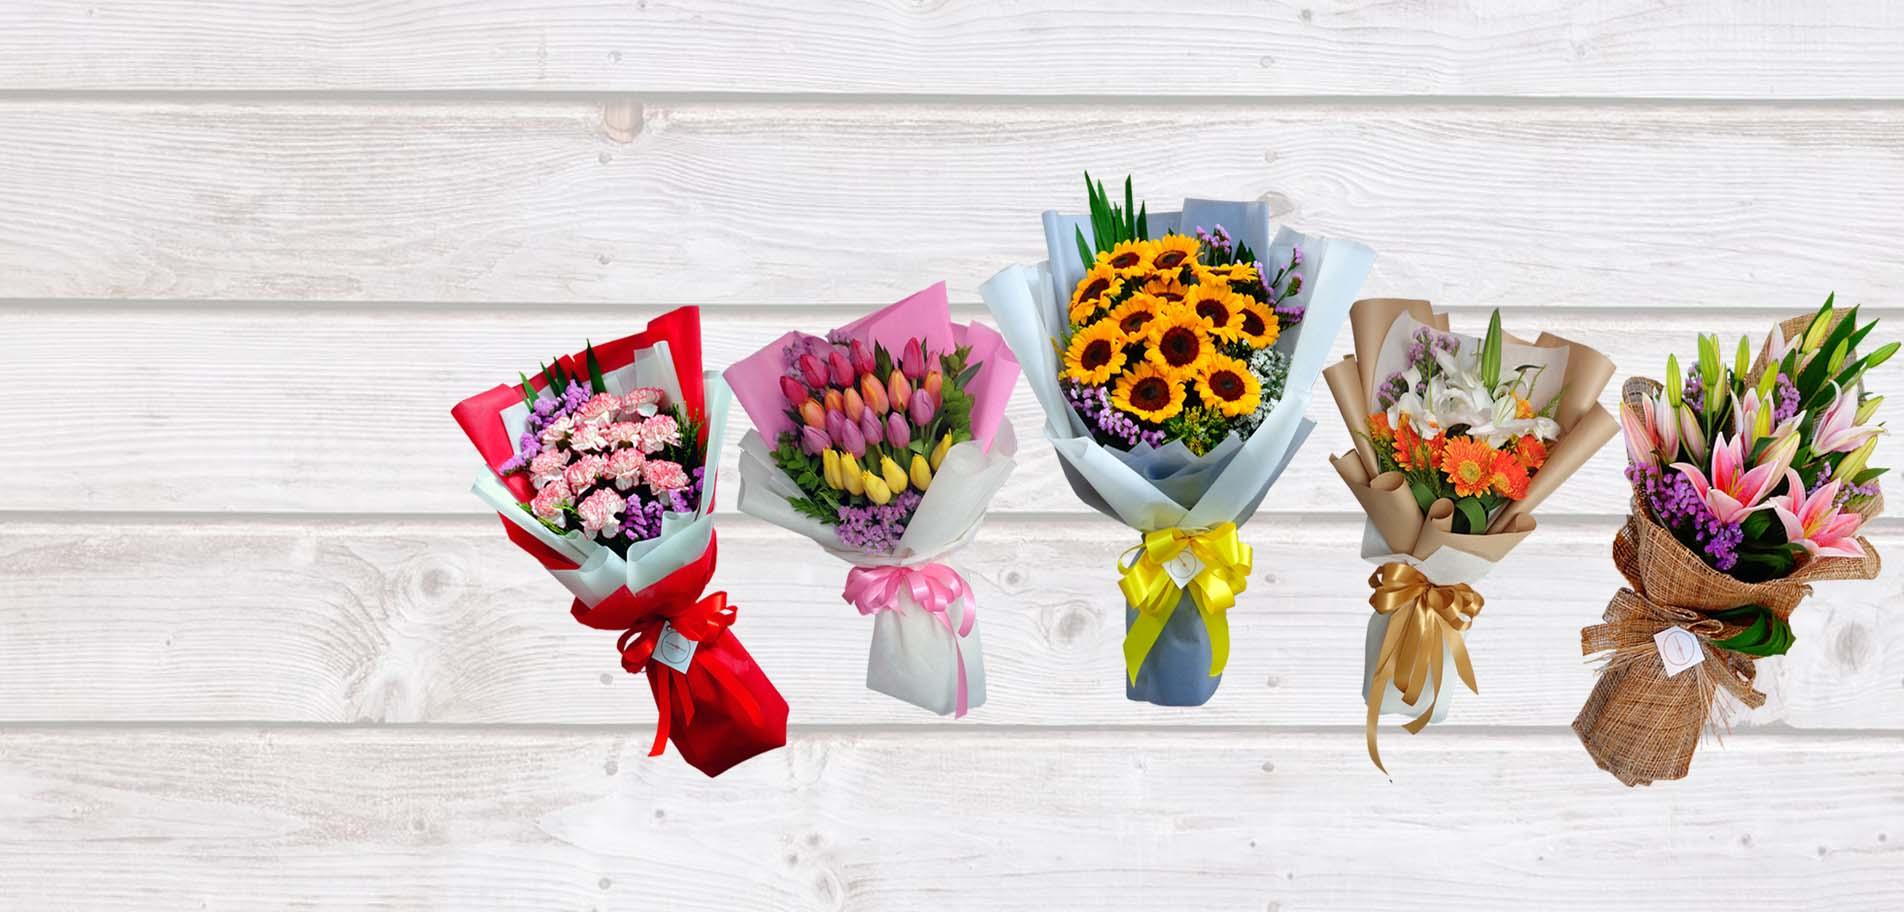 https://yourflowerpatch.com/images/main_slide/bouquet3.jpg